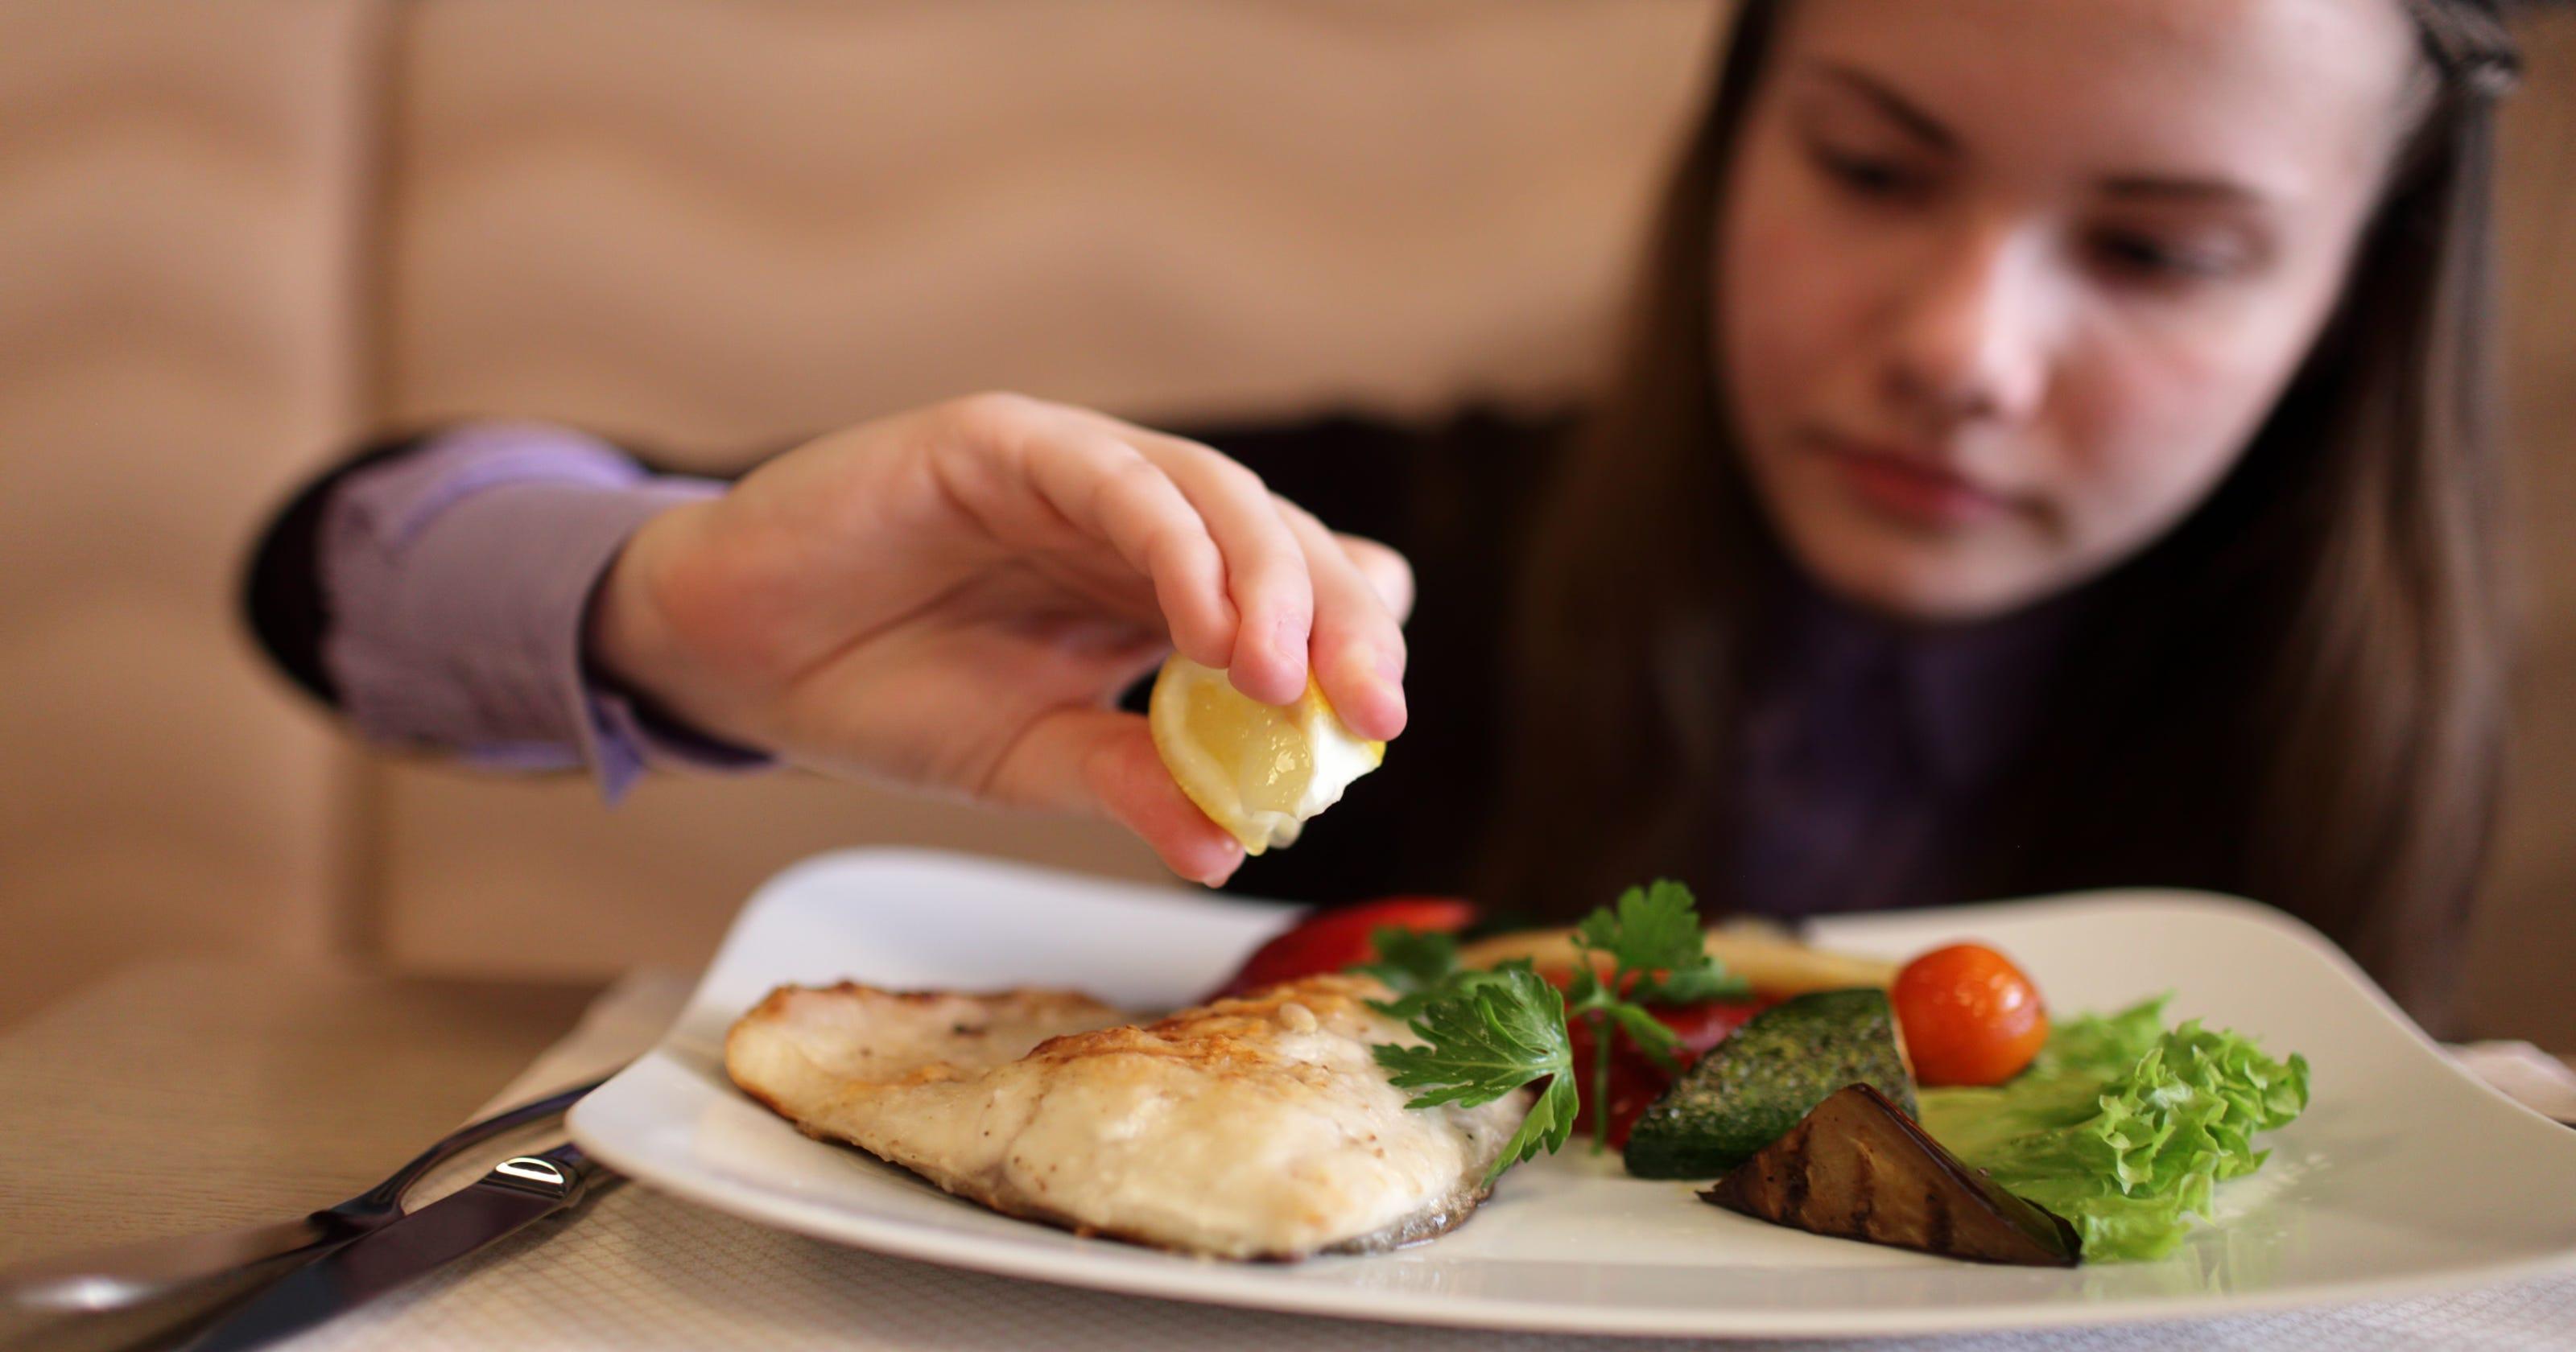 Eating Fish Improves Kids Iq Scores And >> Penn Study Eating Fish May Make Kids Smarter Help Them Sleep